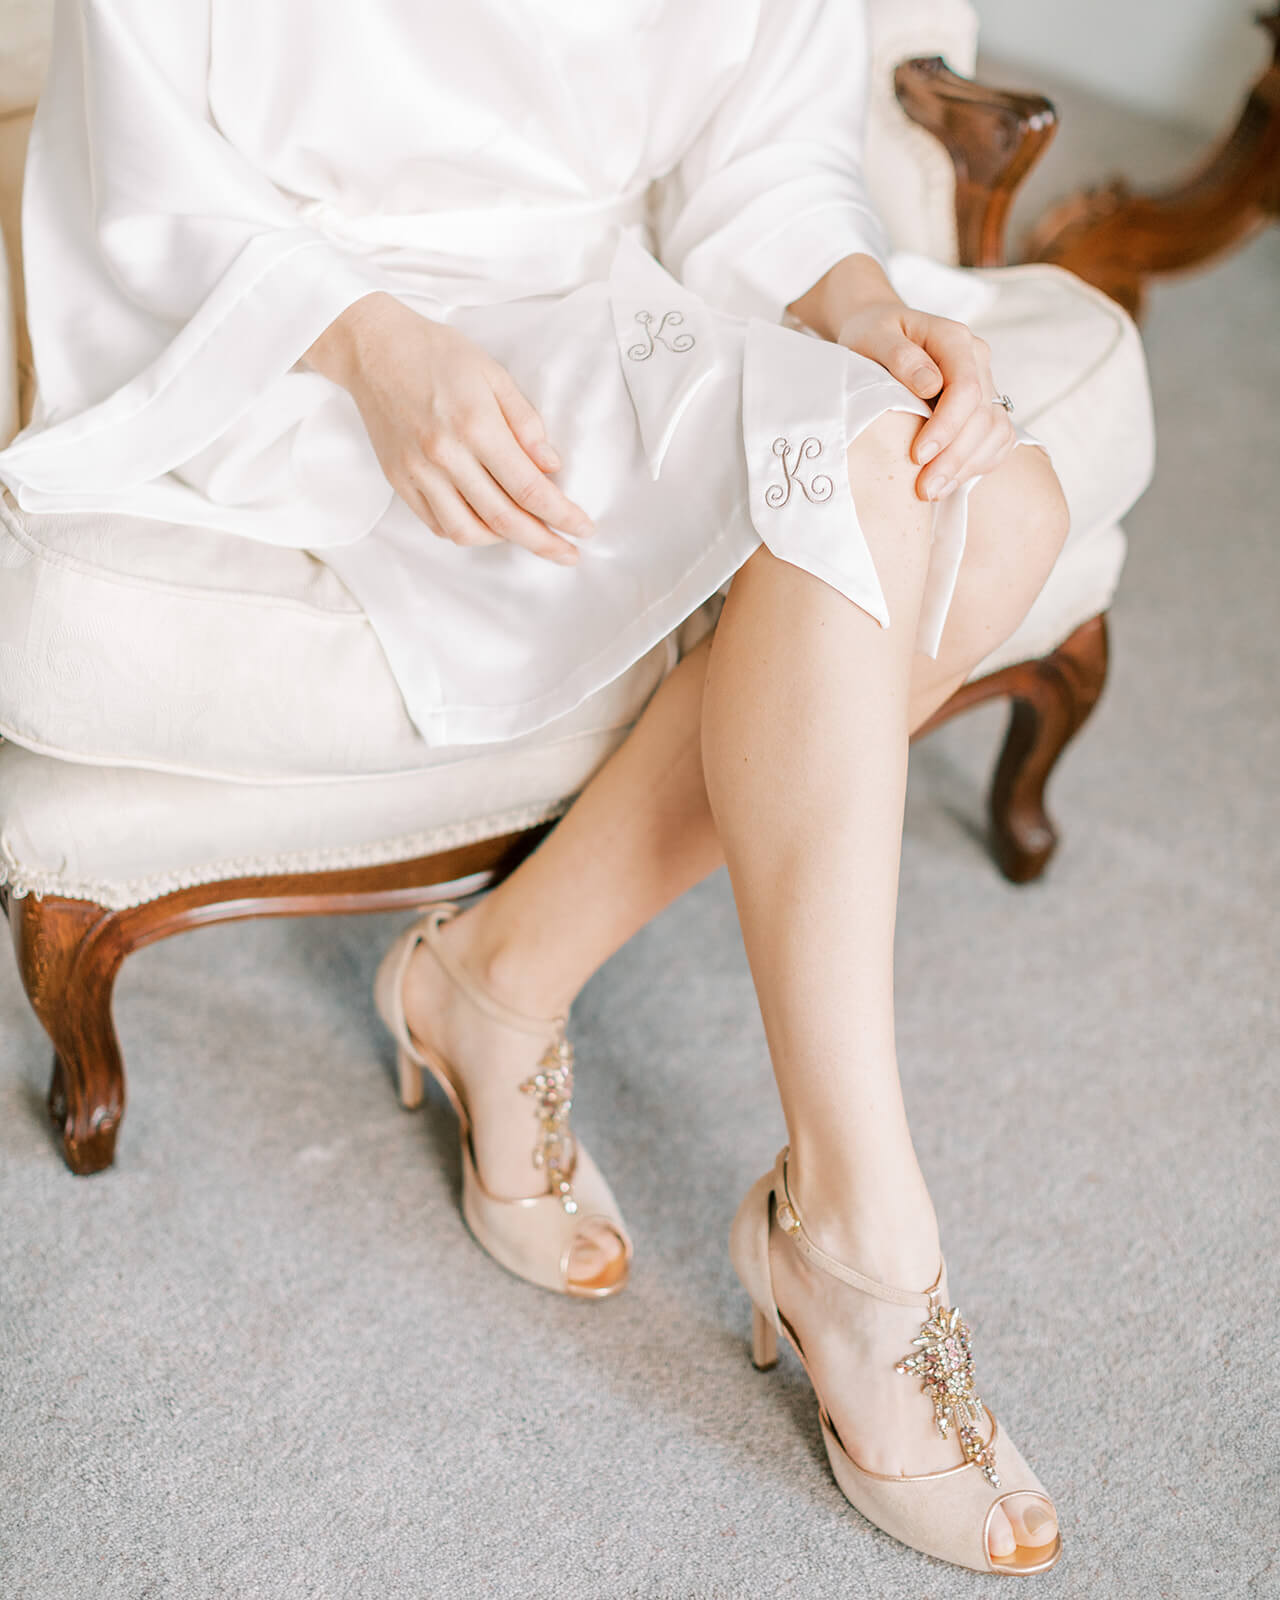 Tutti Frutti blush and gold wedding sandals shown on a models feet